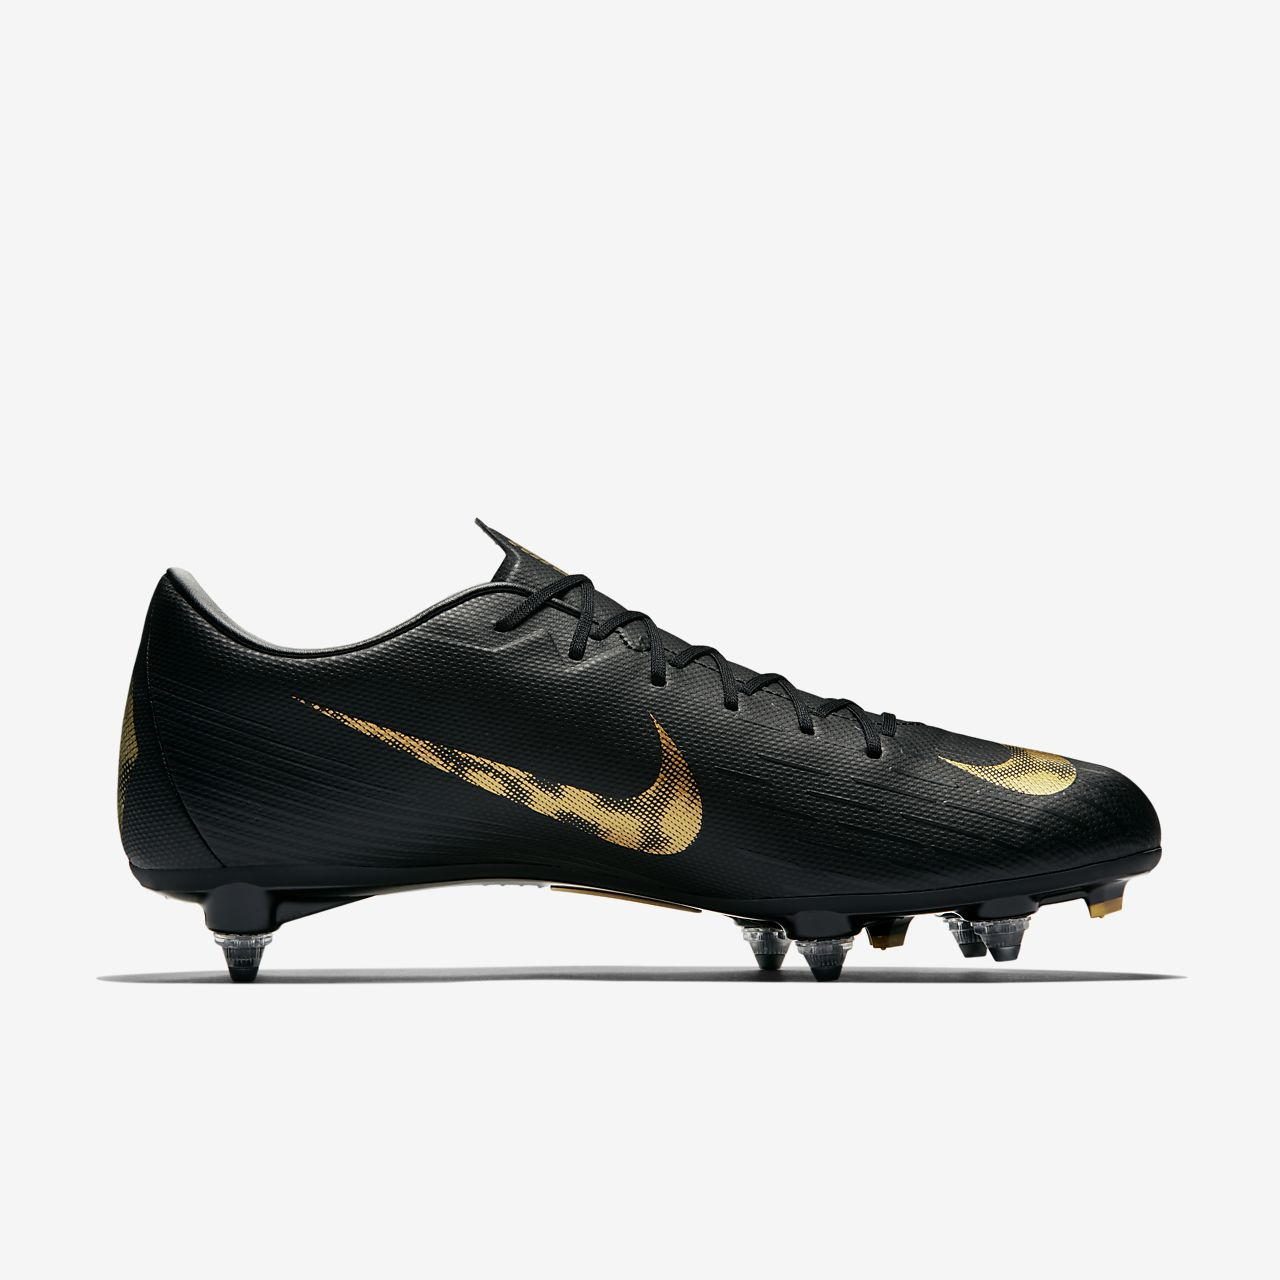 5755f62dcef0 ... Nike Mercurial Vapor XII Academy SG-PRO Soft-Ground Football Boot